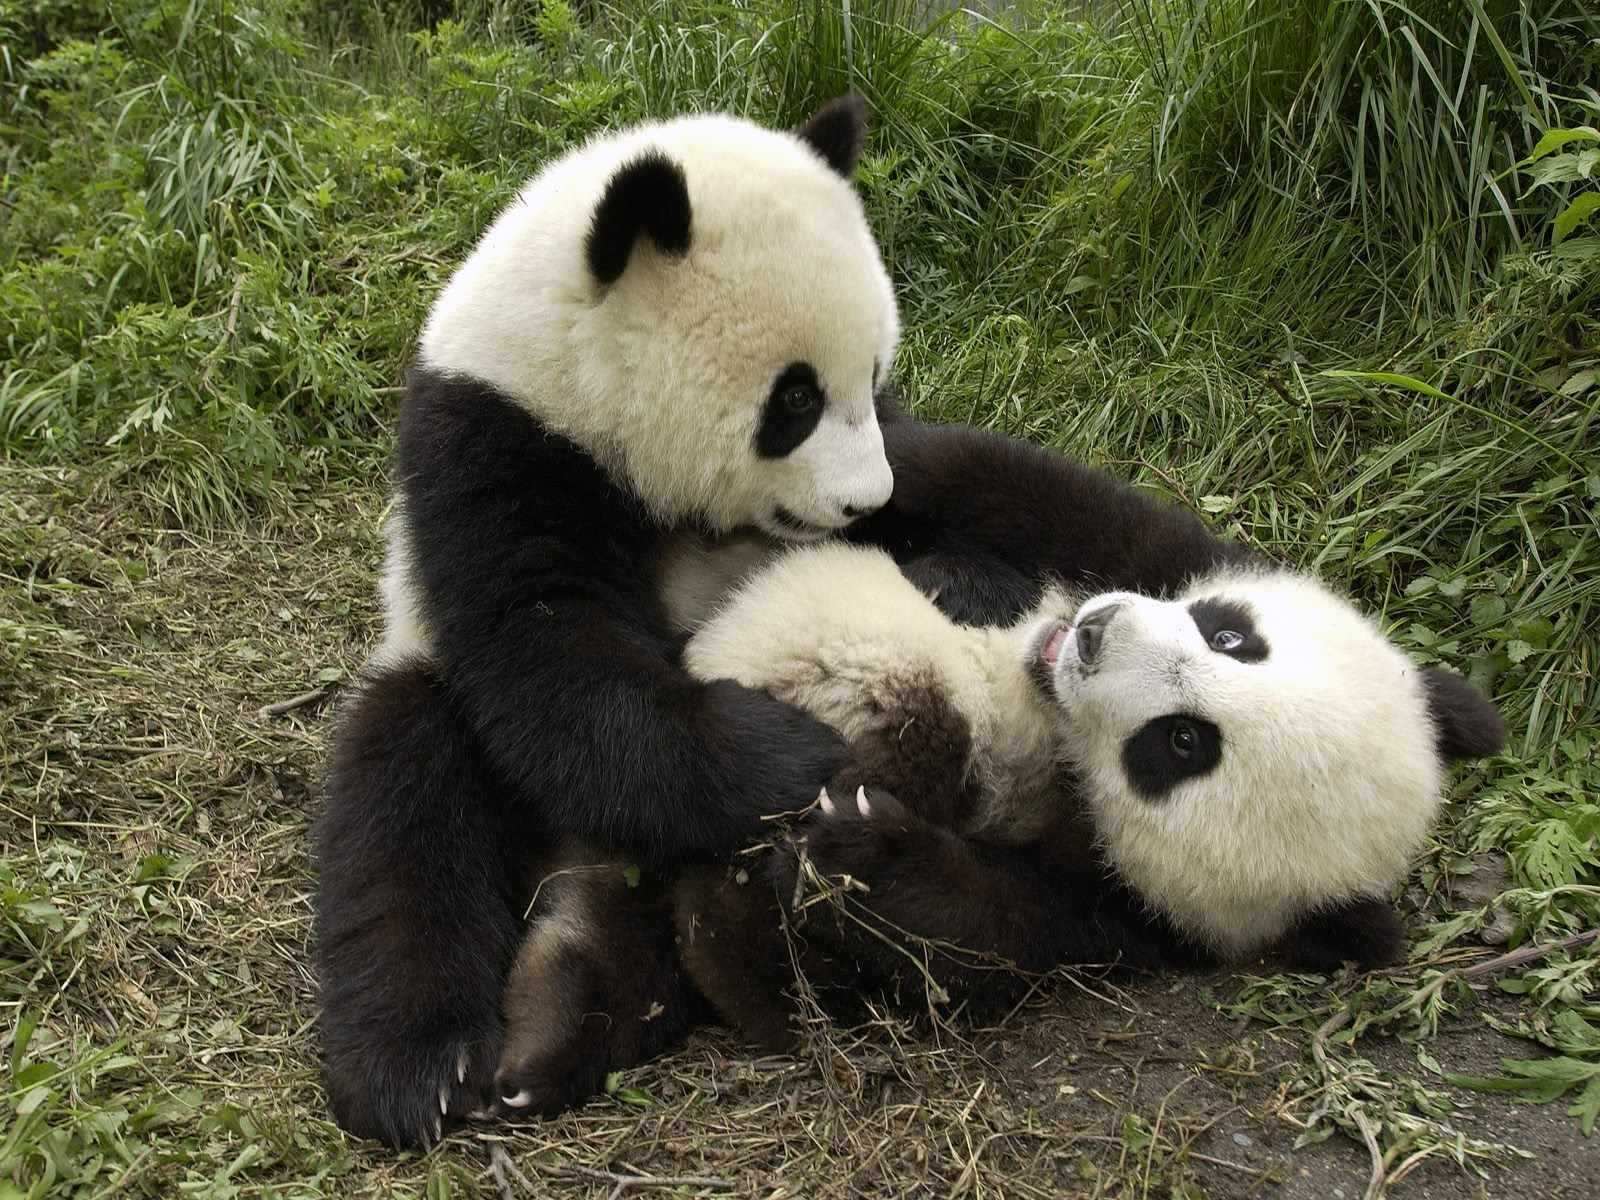 Imagenes De Ositos Panda - Osos Panda. Características de los osos panda. Fotos de